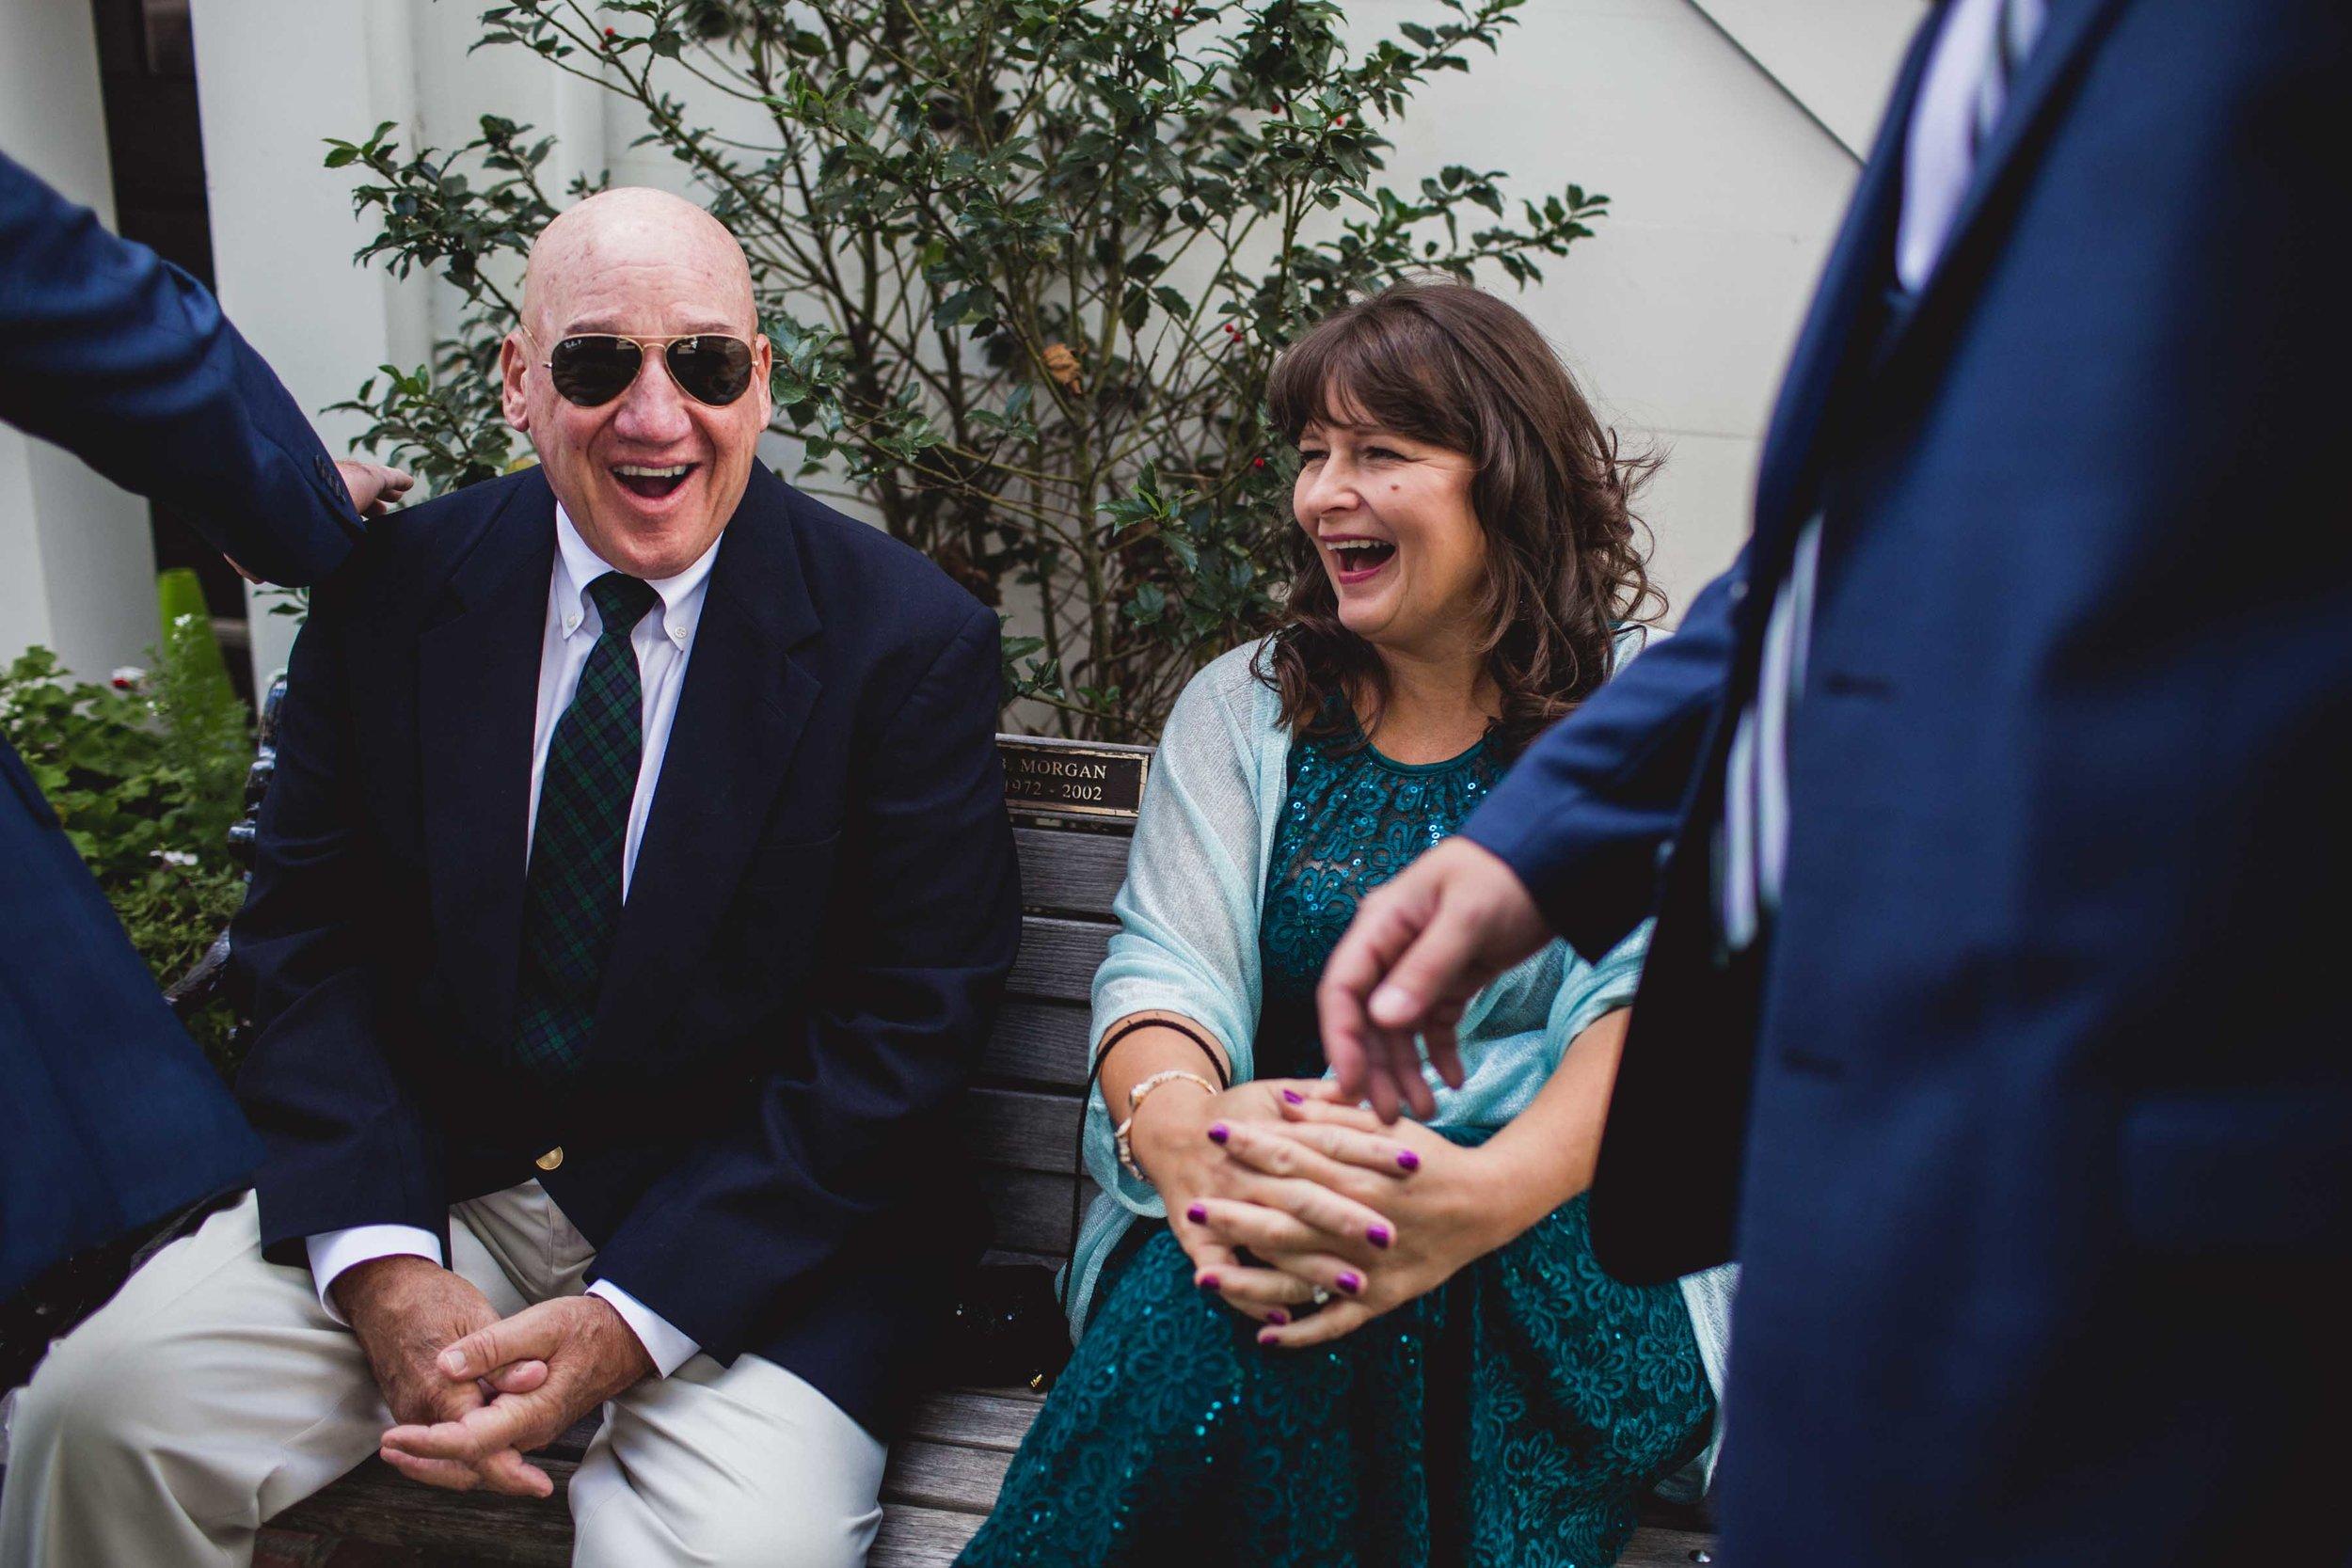 Marthas-vineyard-wedding-10.jpg